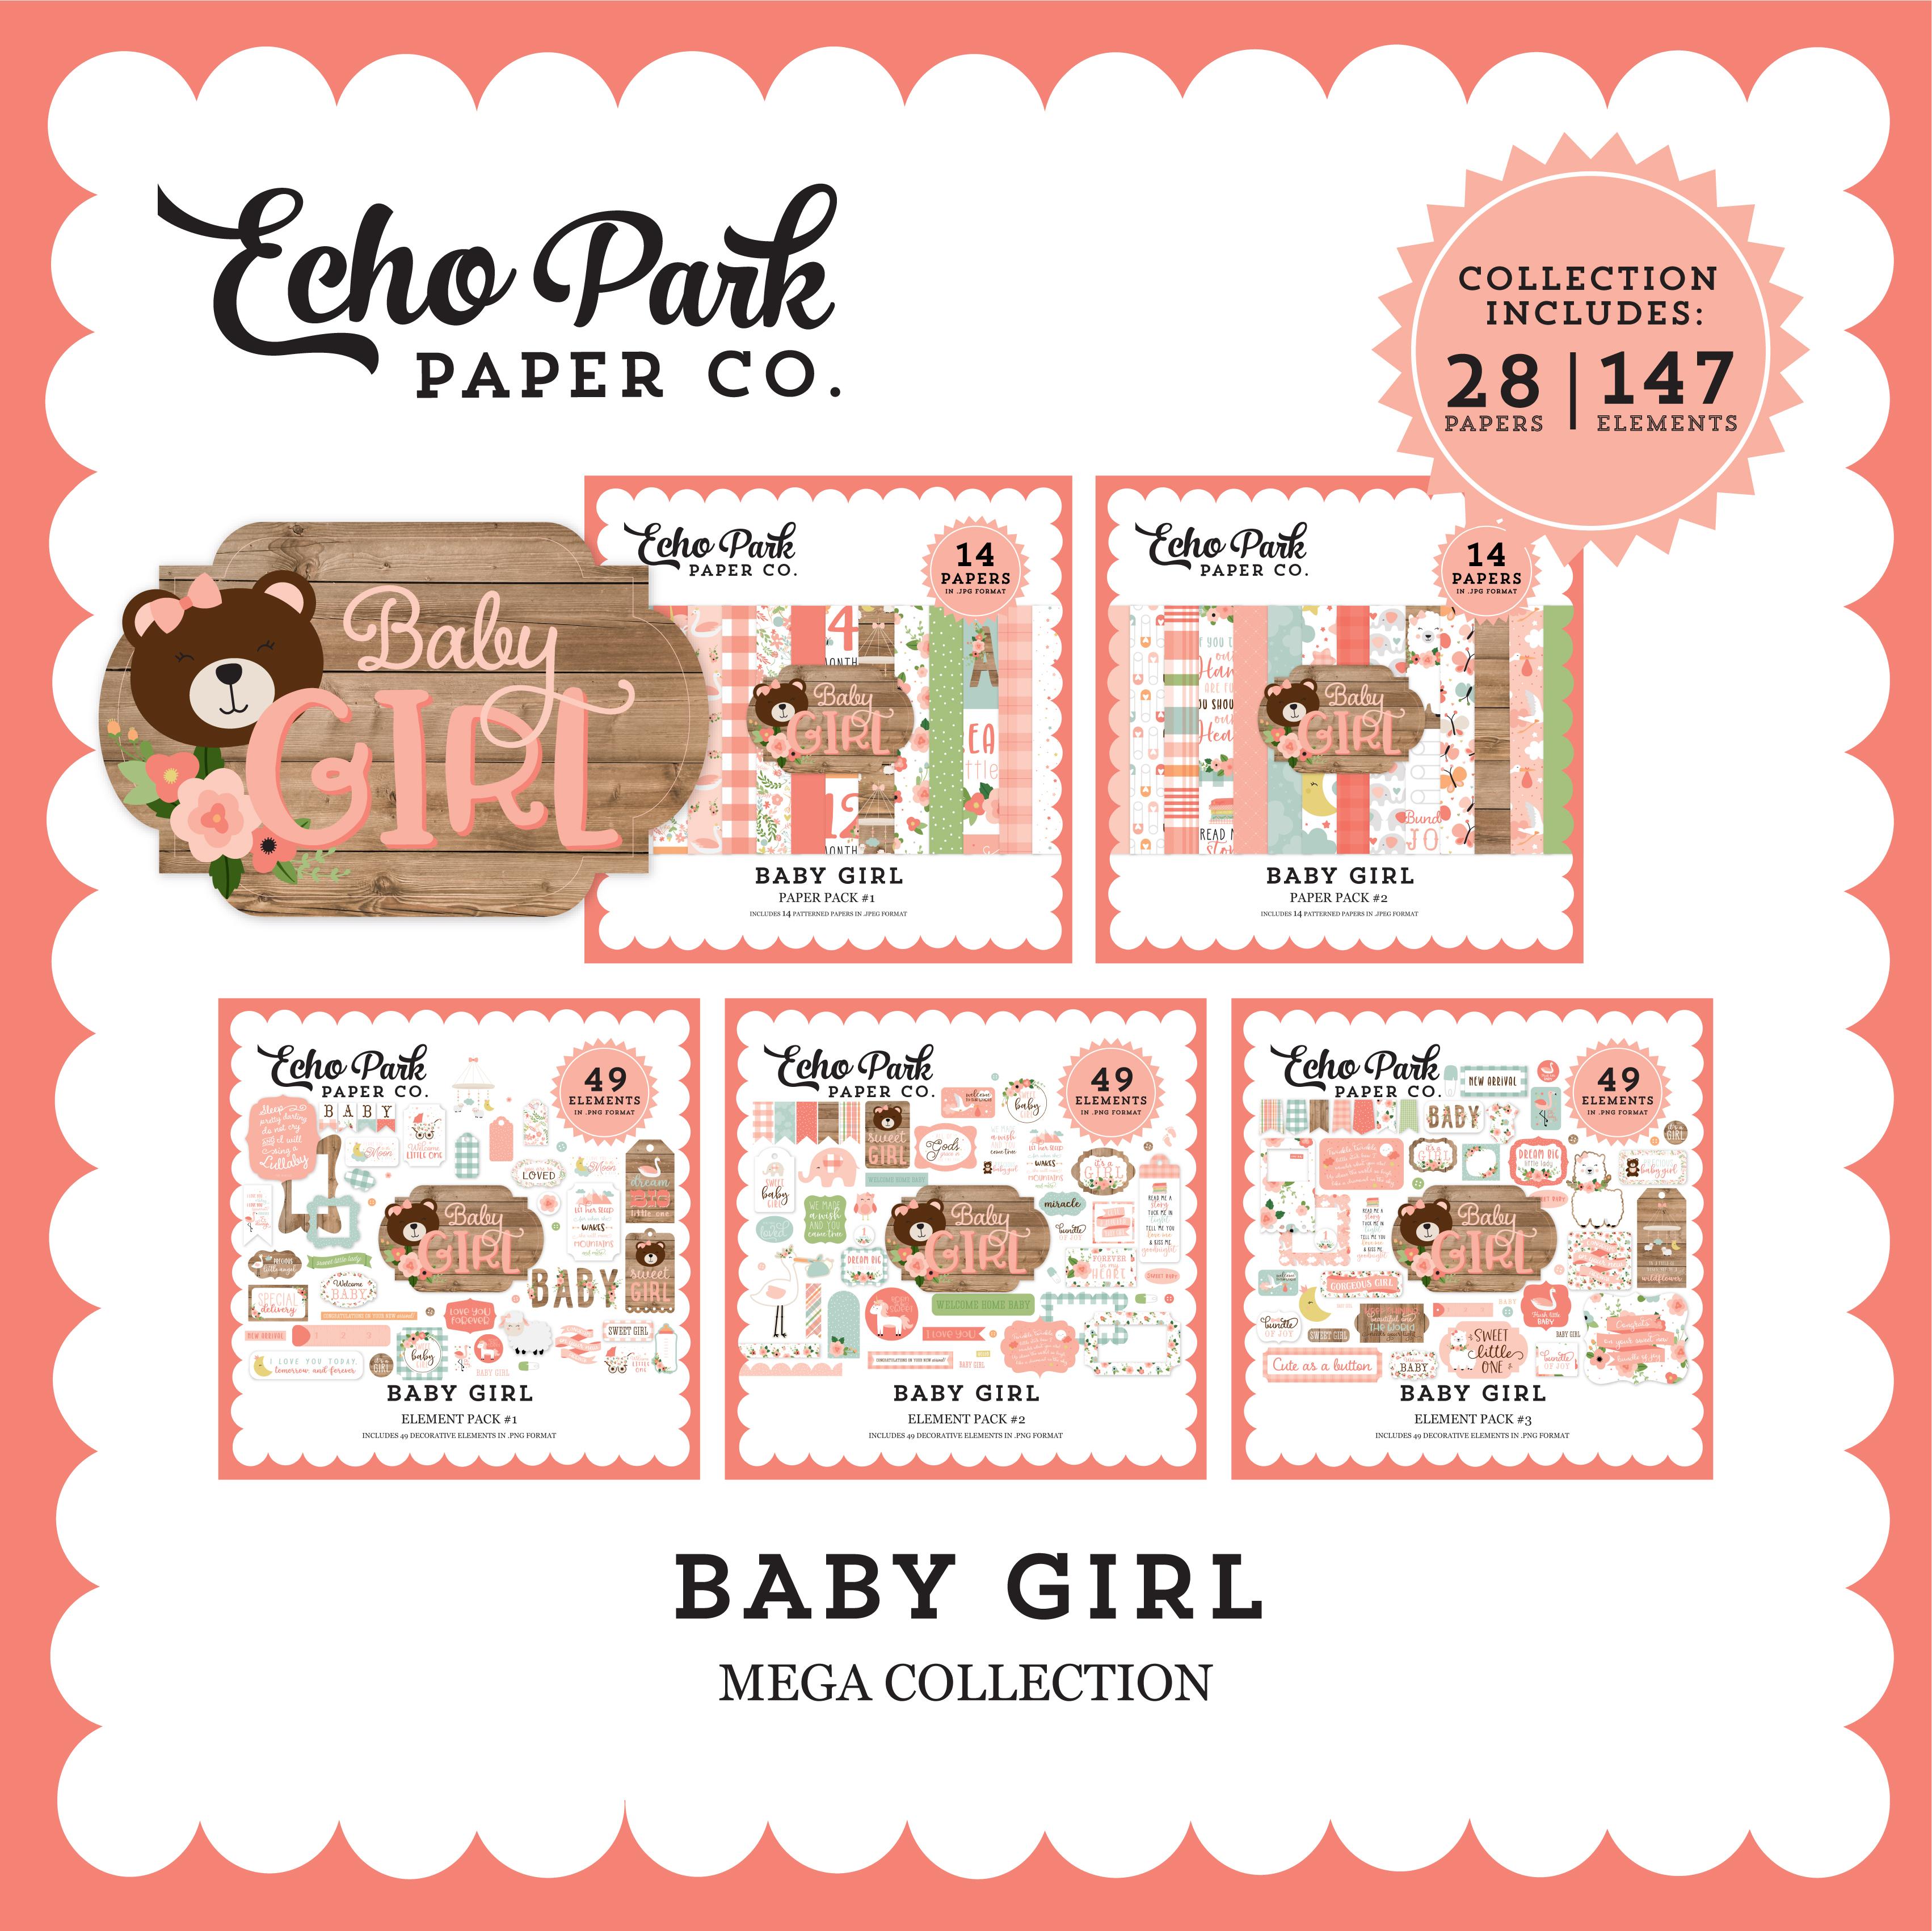 Baby Girl Mega Collection